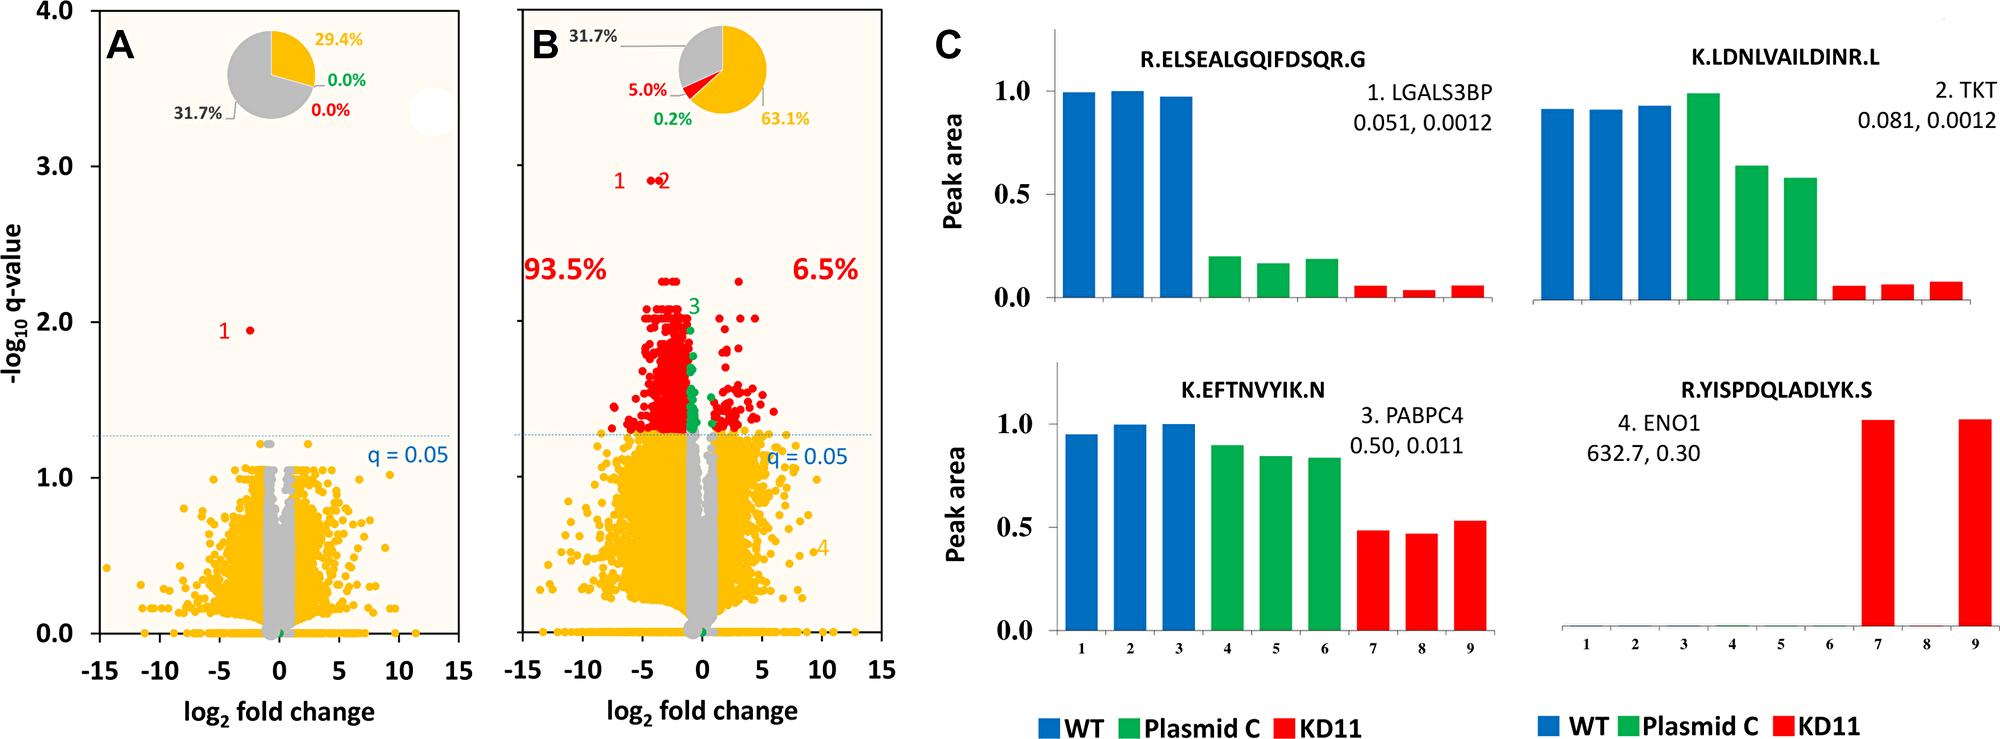 Volcano plot of fold change versus q-value of peak area for distinct peptides.